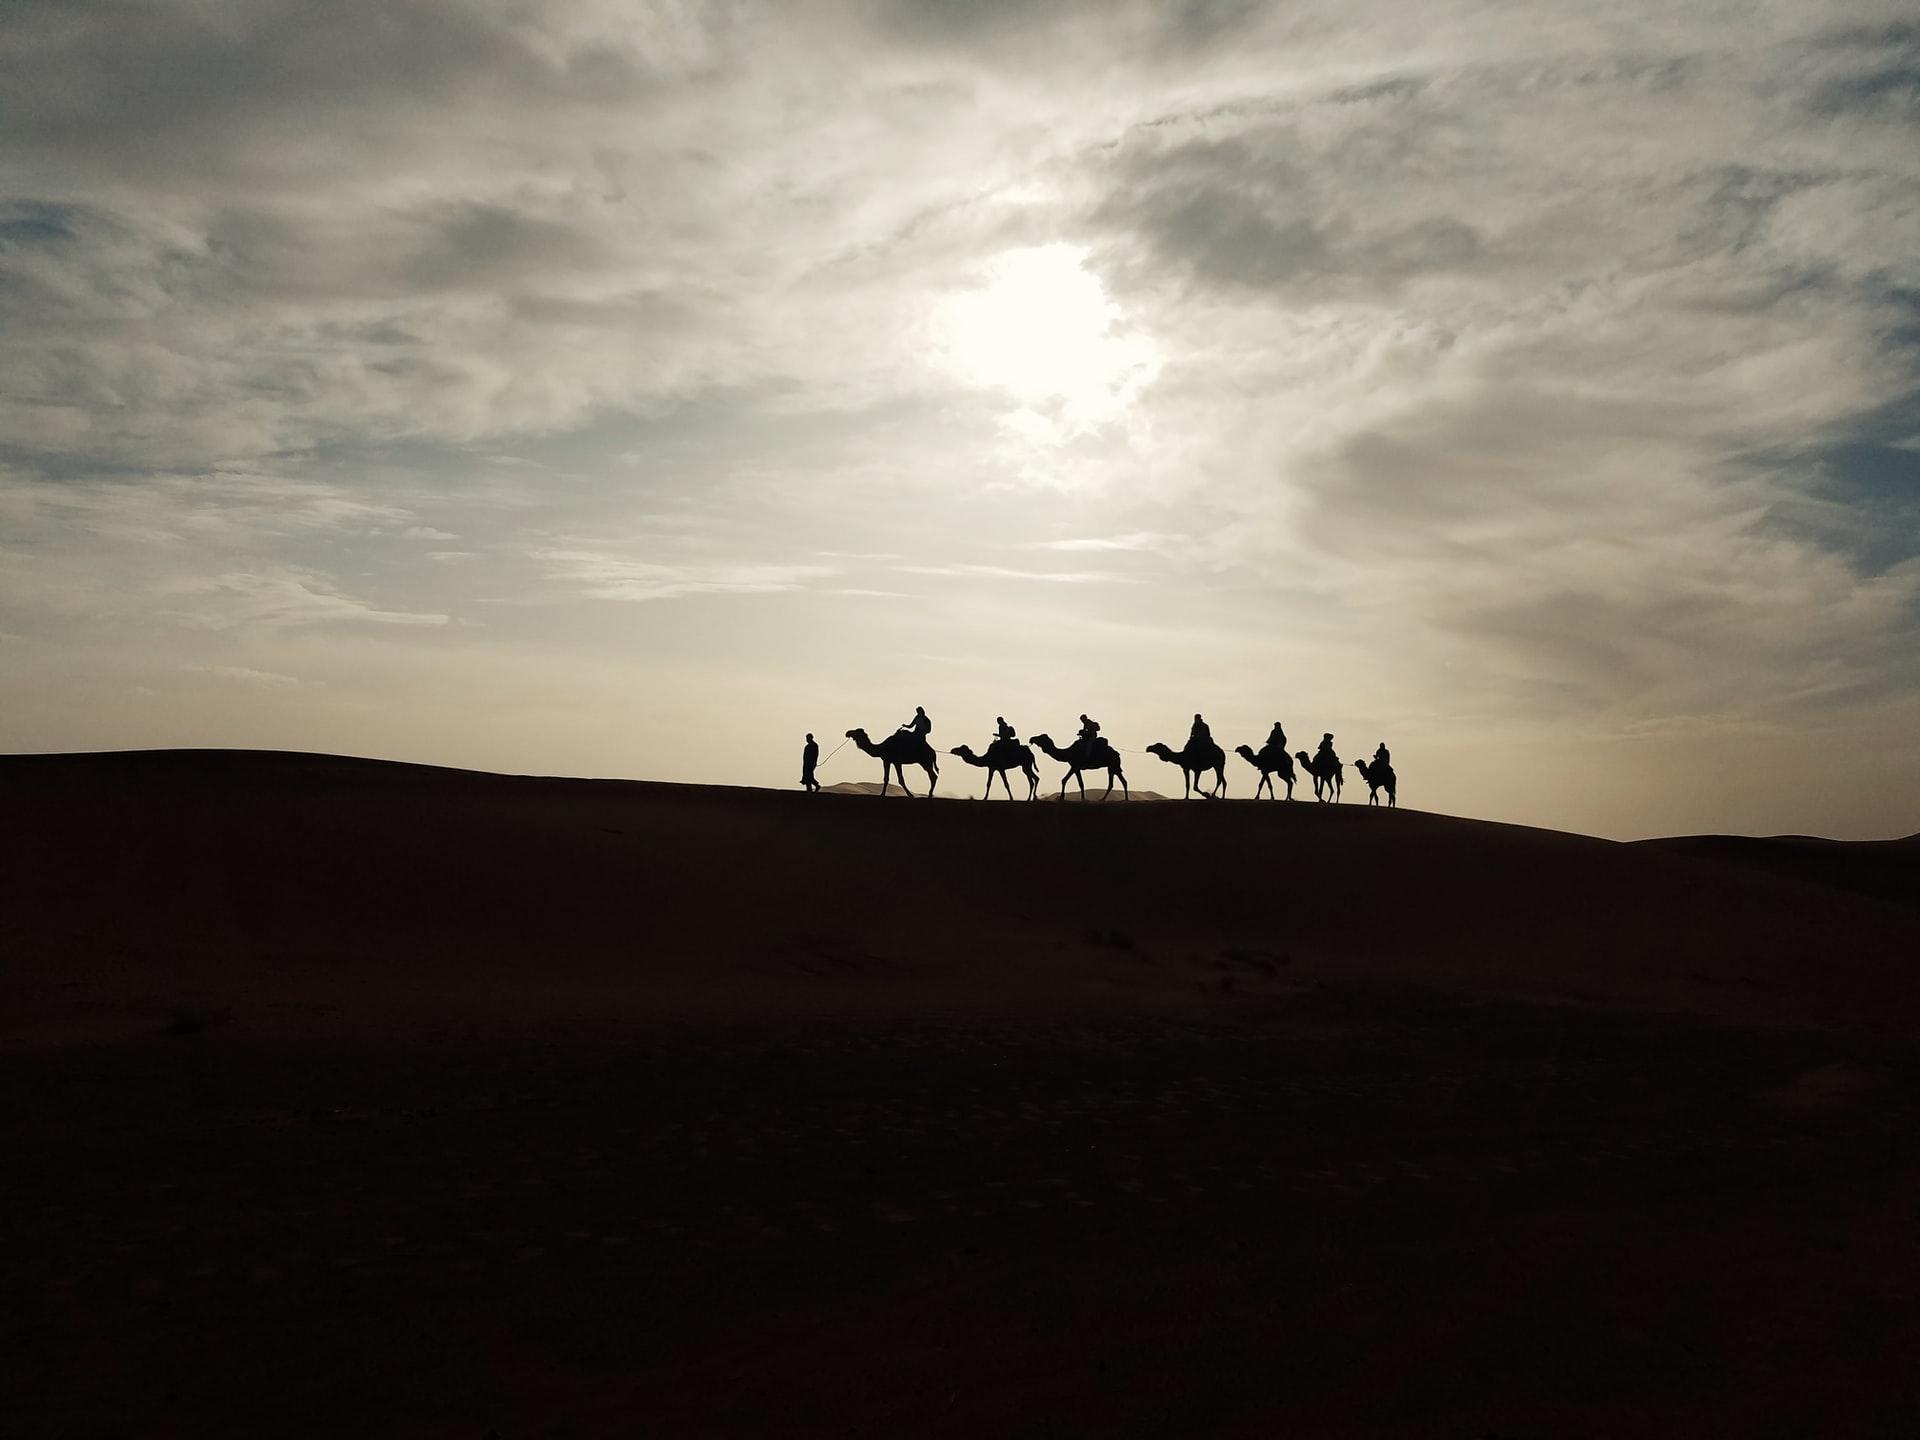 picture of camels magi visiting jesus www.atozmomm.com